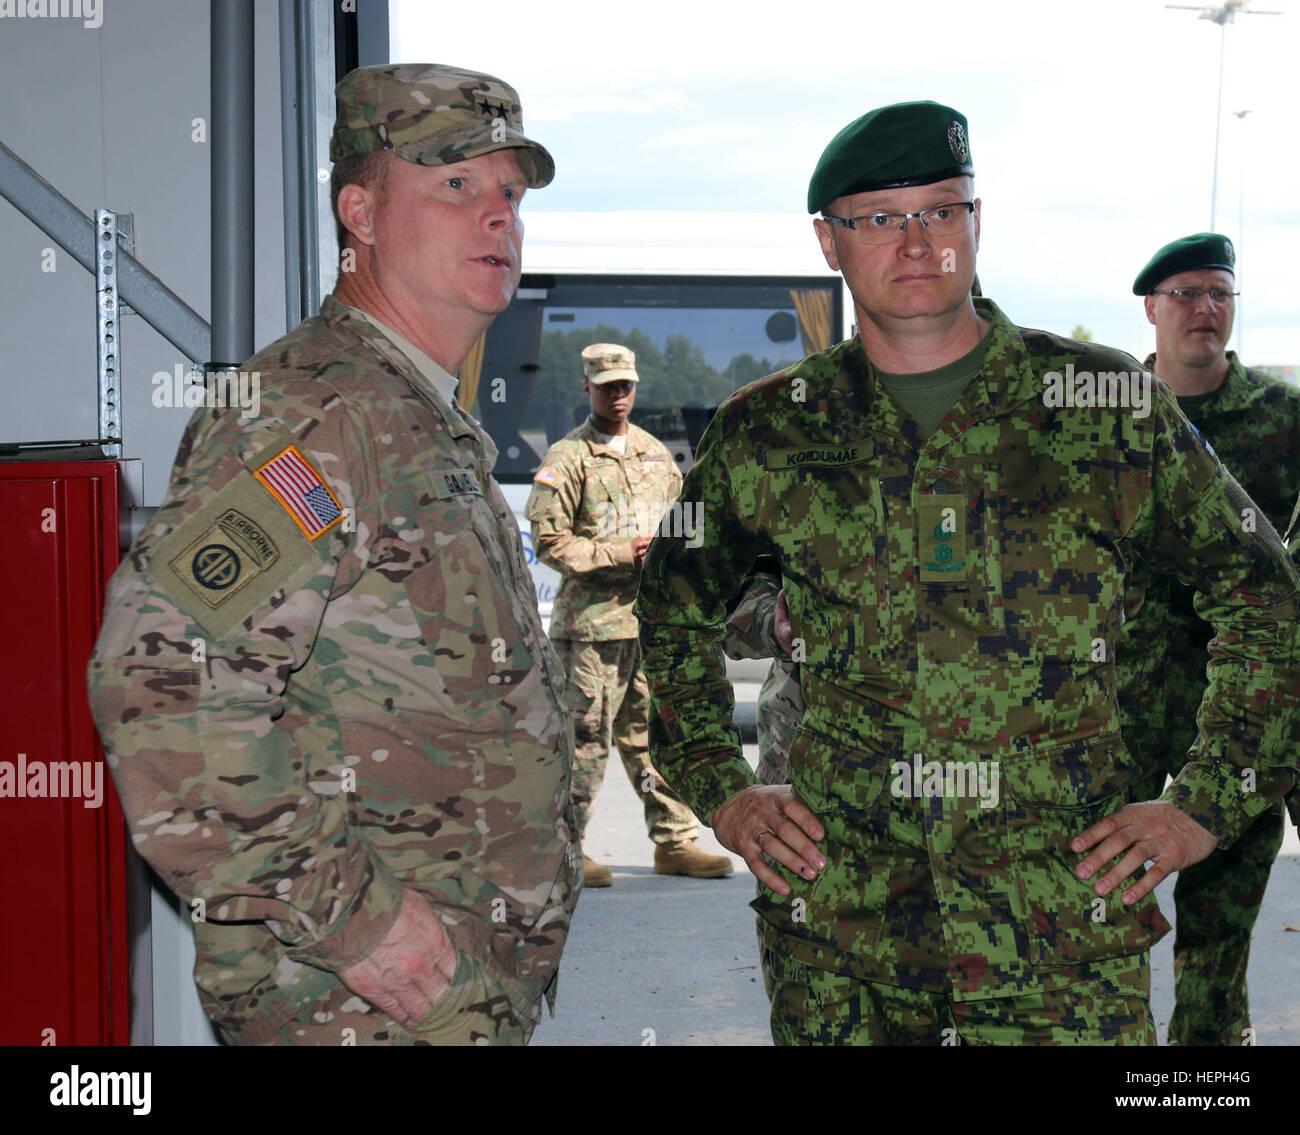 Maj. Gen. Duane A. Gamble, commander, 21st Theater Sustainment Command since June 24, 2015, speaks with Estonian - Stock Image